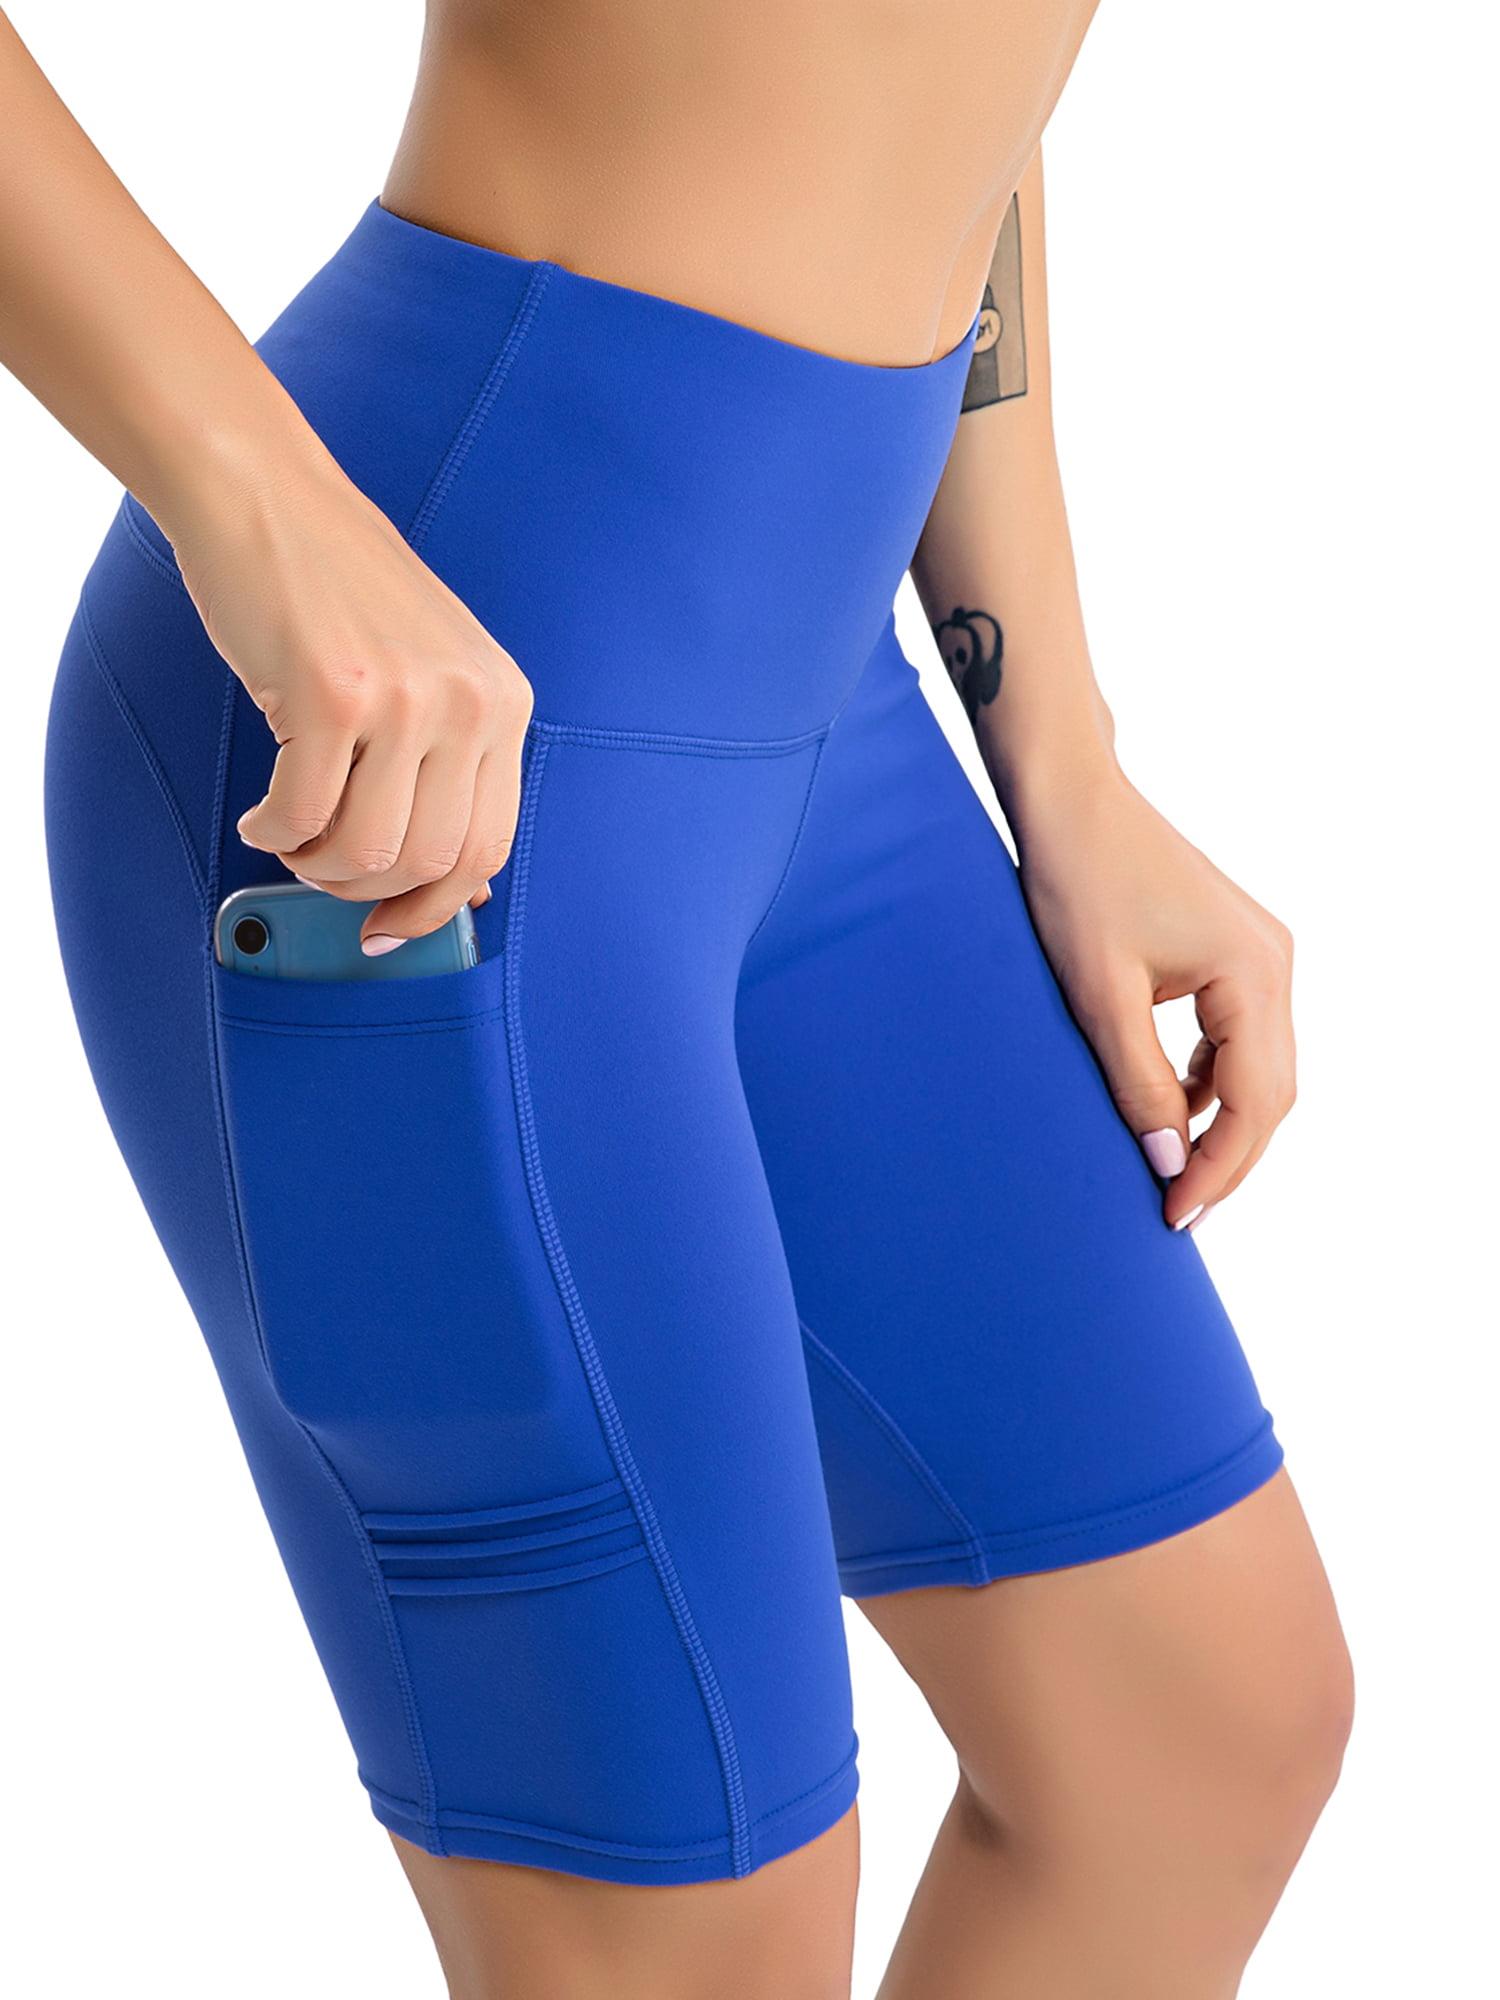 Sexy Dance - High Waist Workout Yoga Shorts for Women ...